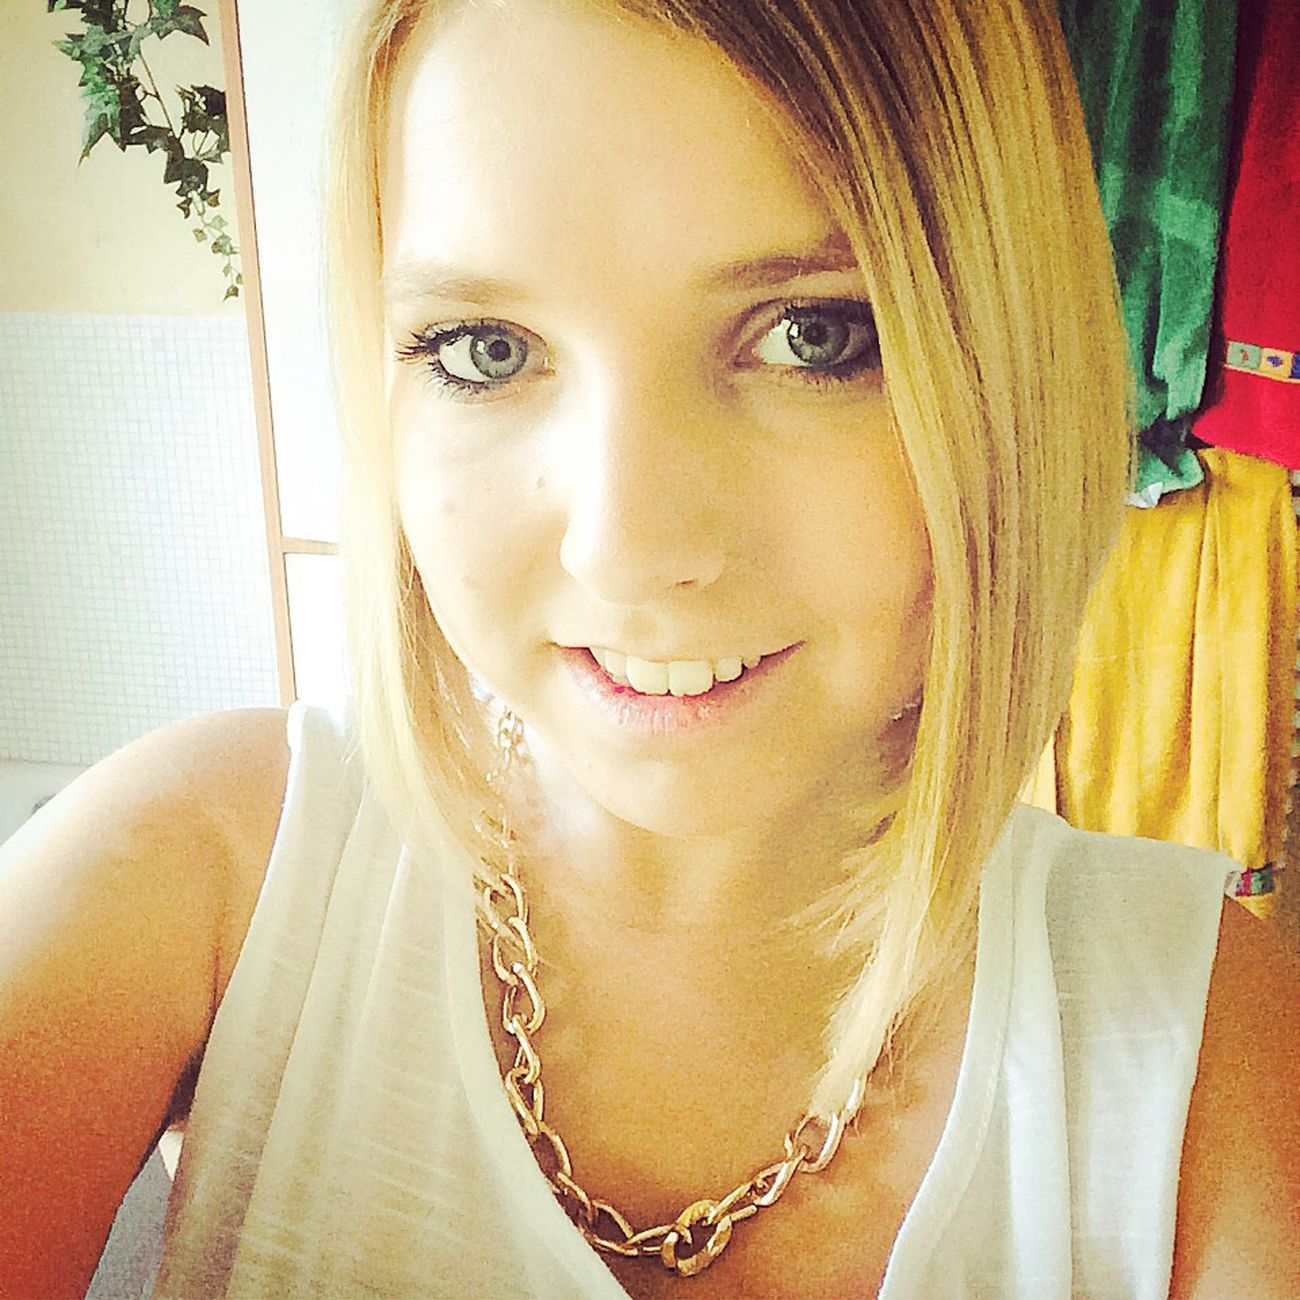 Sexy Girl Smile Lächeln Blond Hair